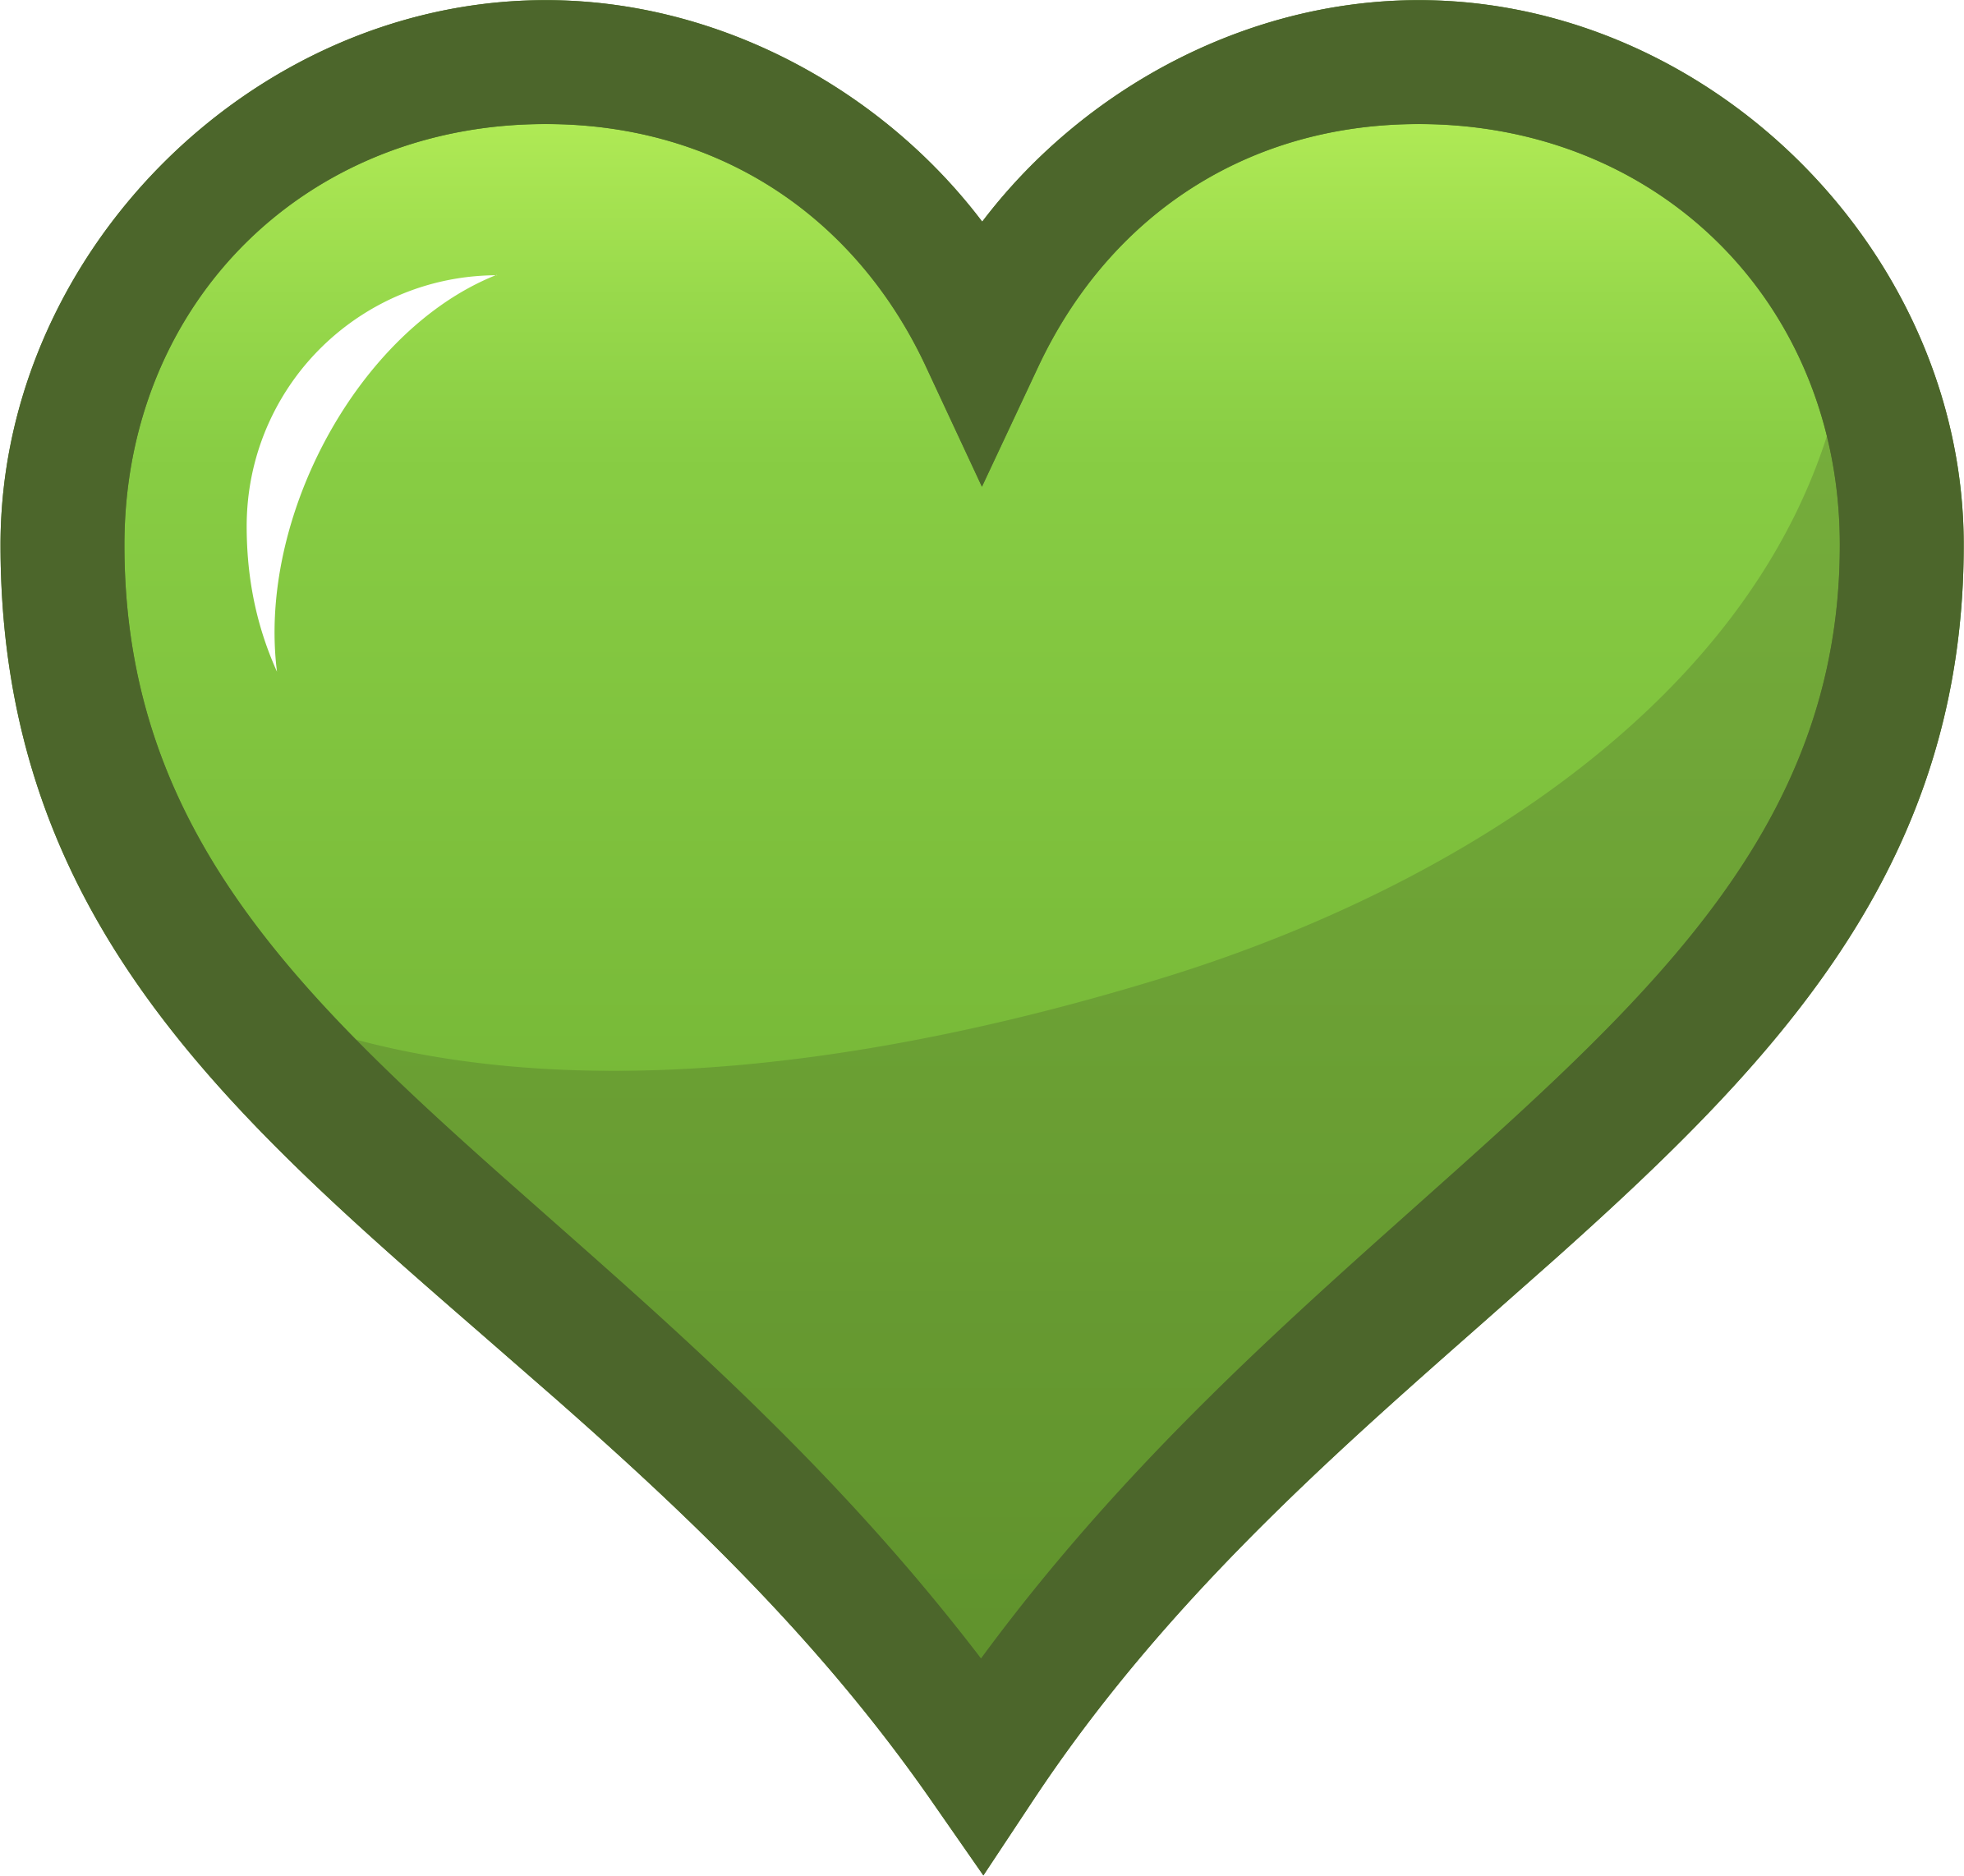 Hearts clipart icon Icon Green Heart Clipart Green